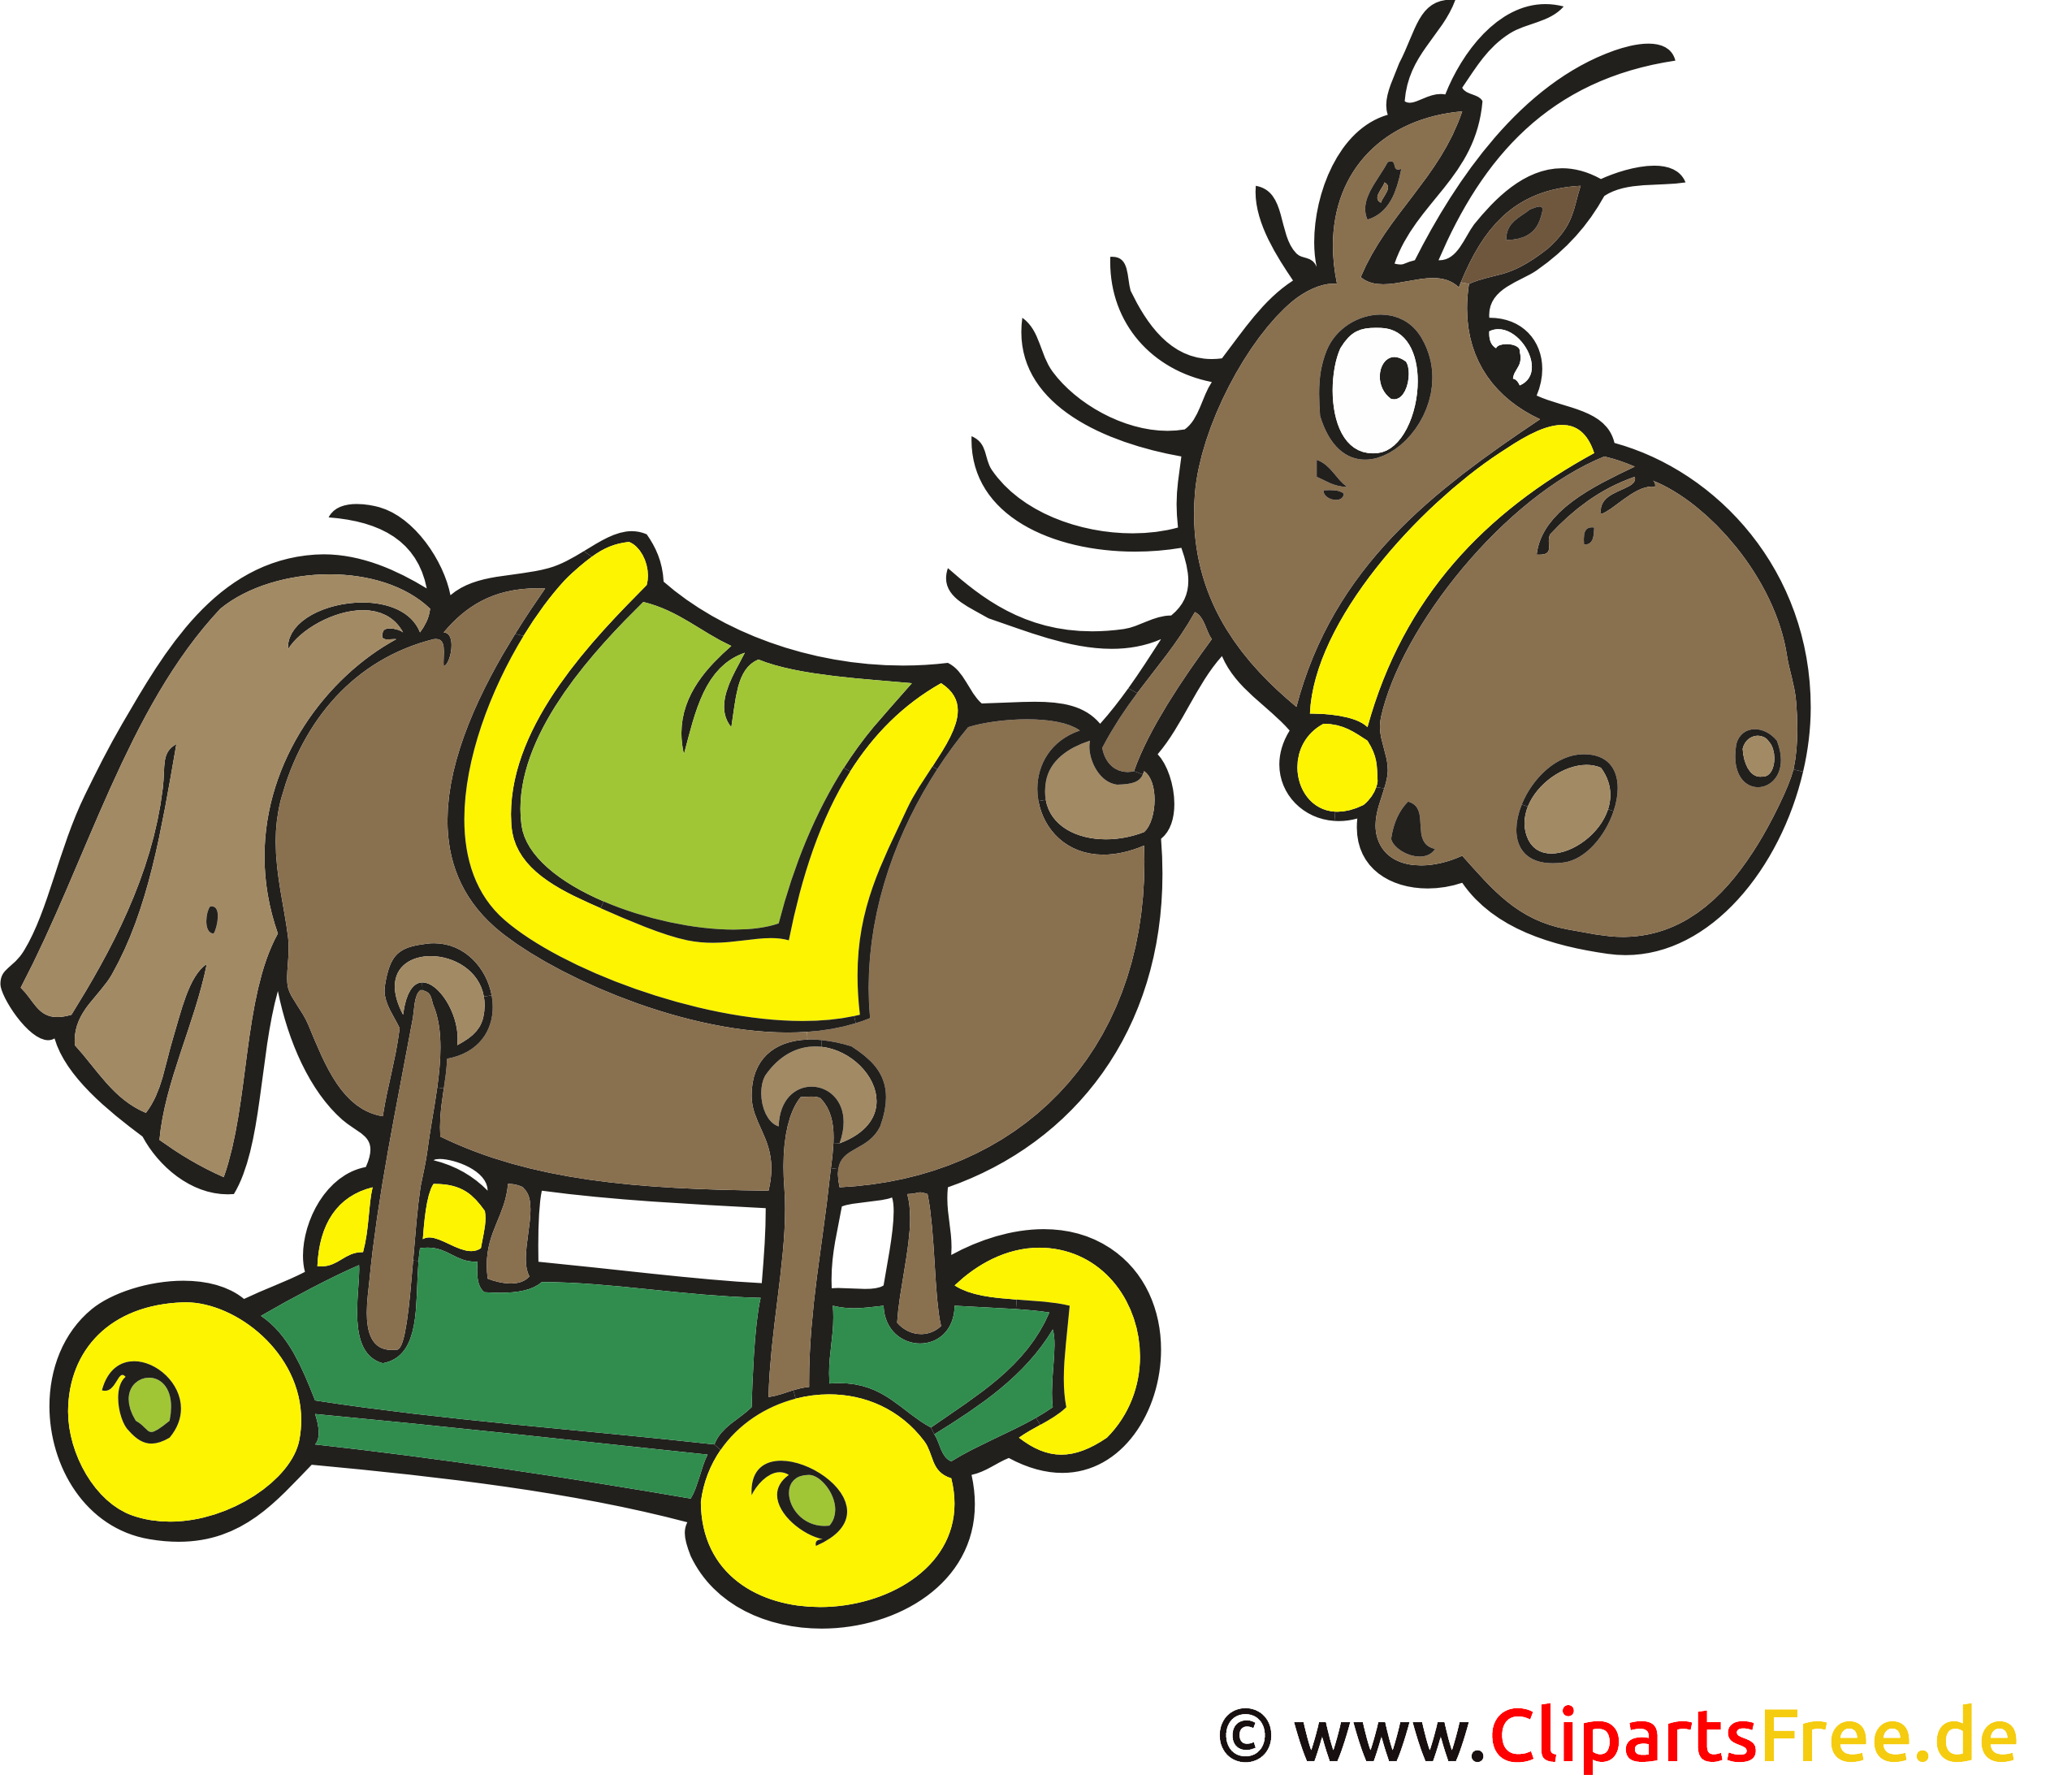 Pferdschauckel spielzeug cartoon bild clipart illustration